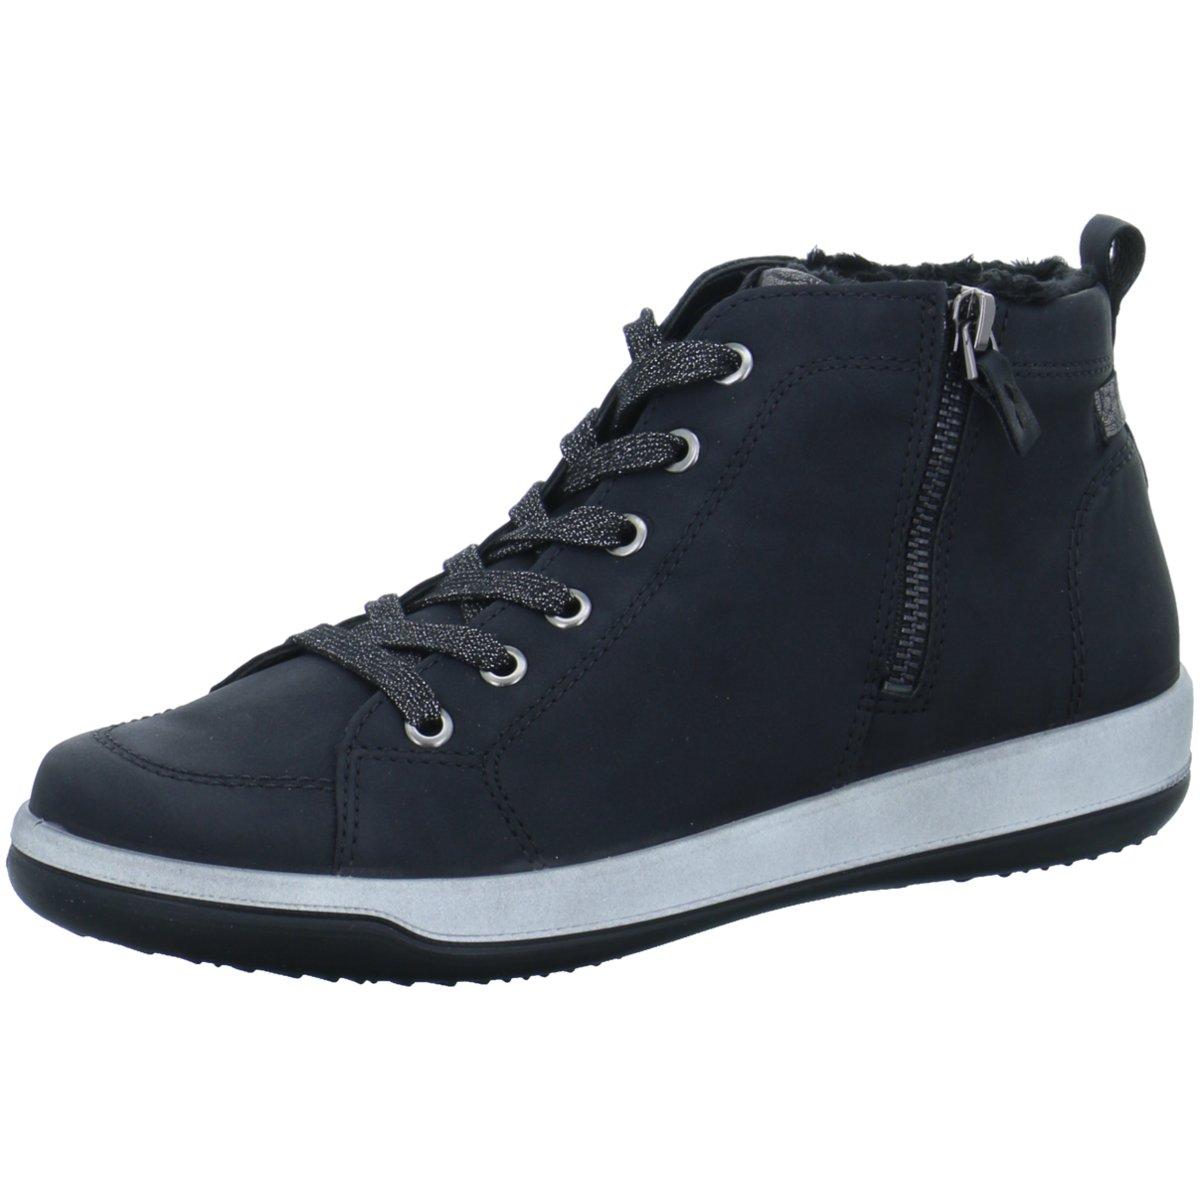 7852fd50d709 Nike Kyrie Irving 1 ID Mens size 13 Foams Air Air Air Jordan fb8317 ...